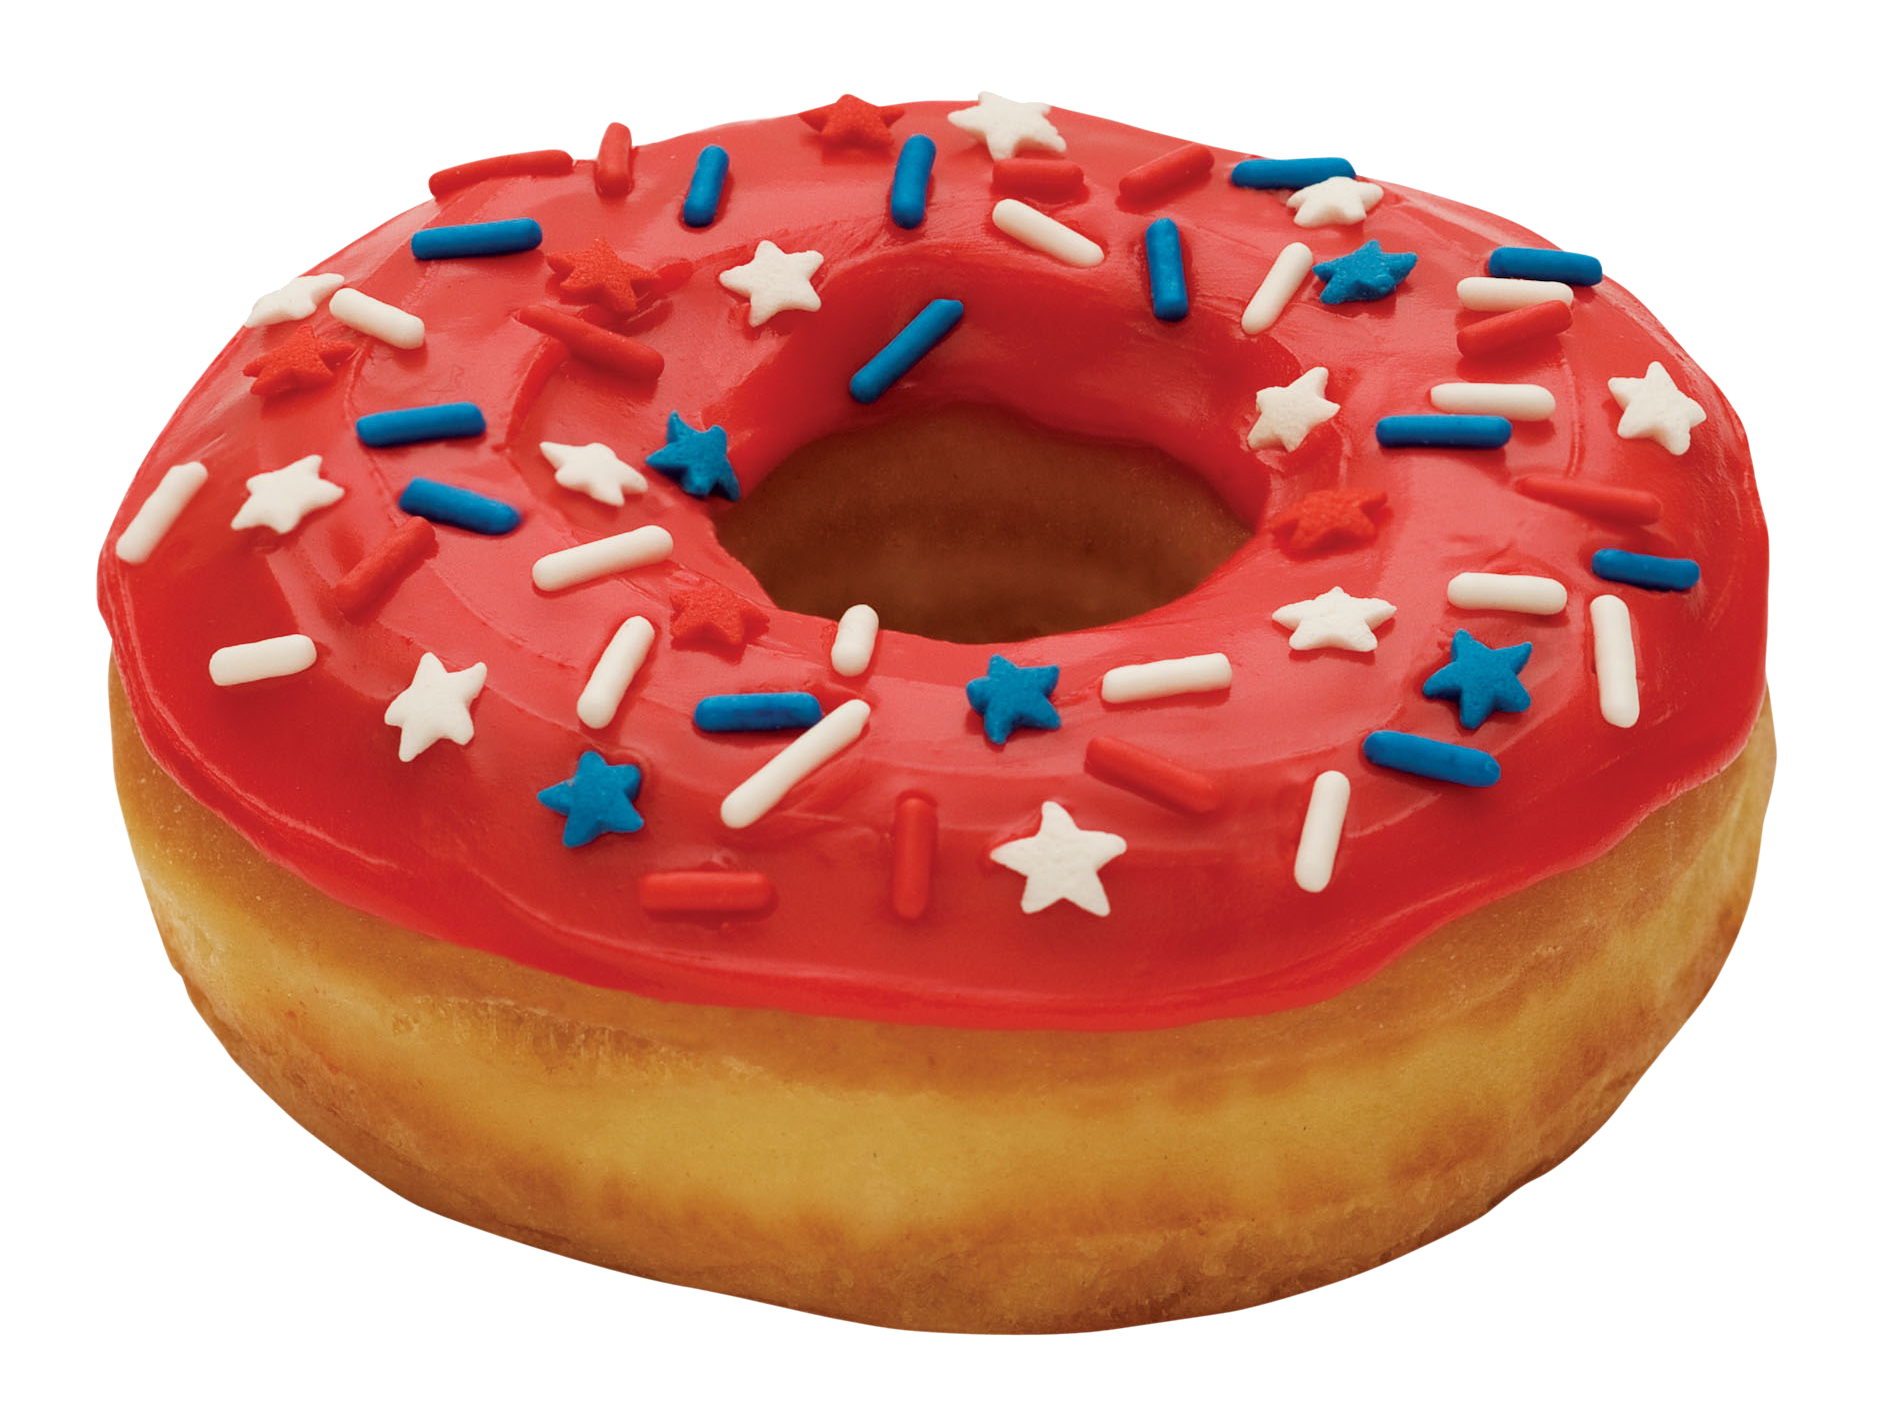 Doughnut clipart sugar donut. Cup png transparent image